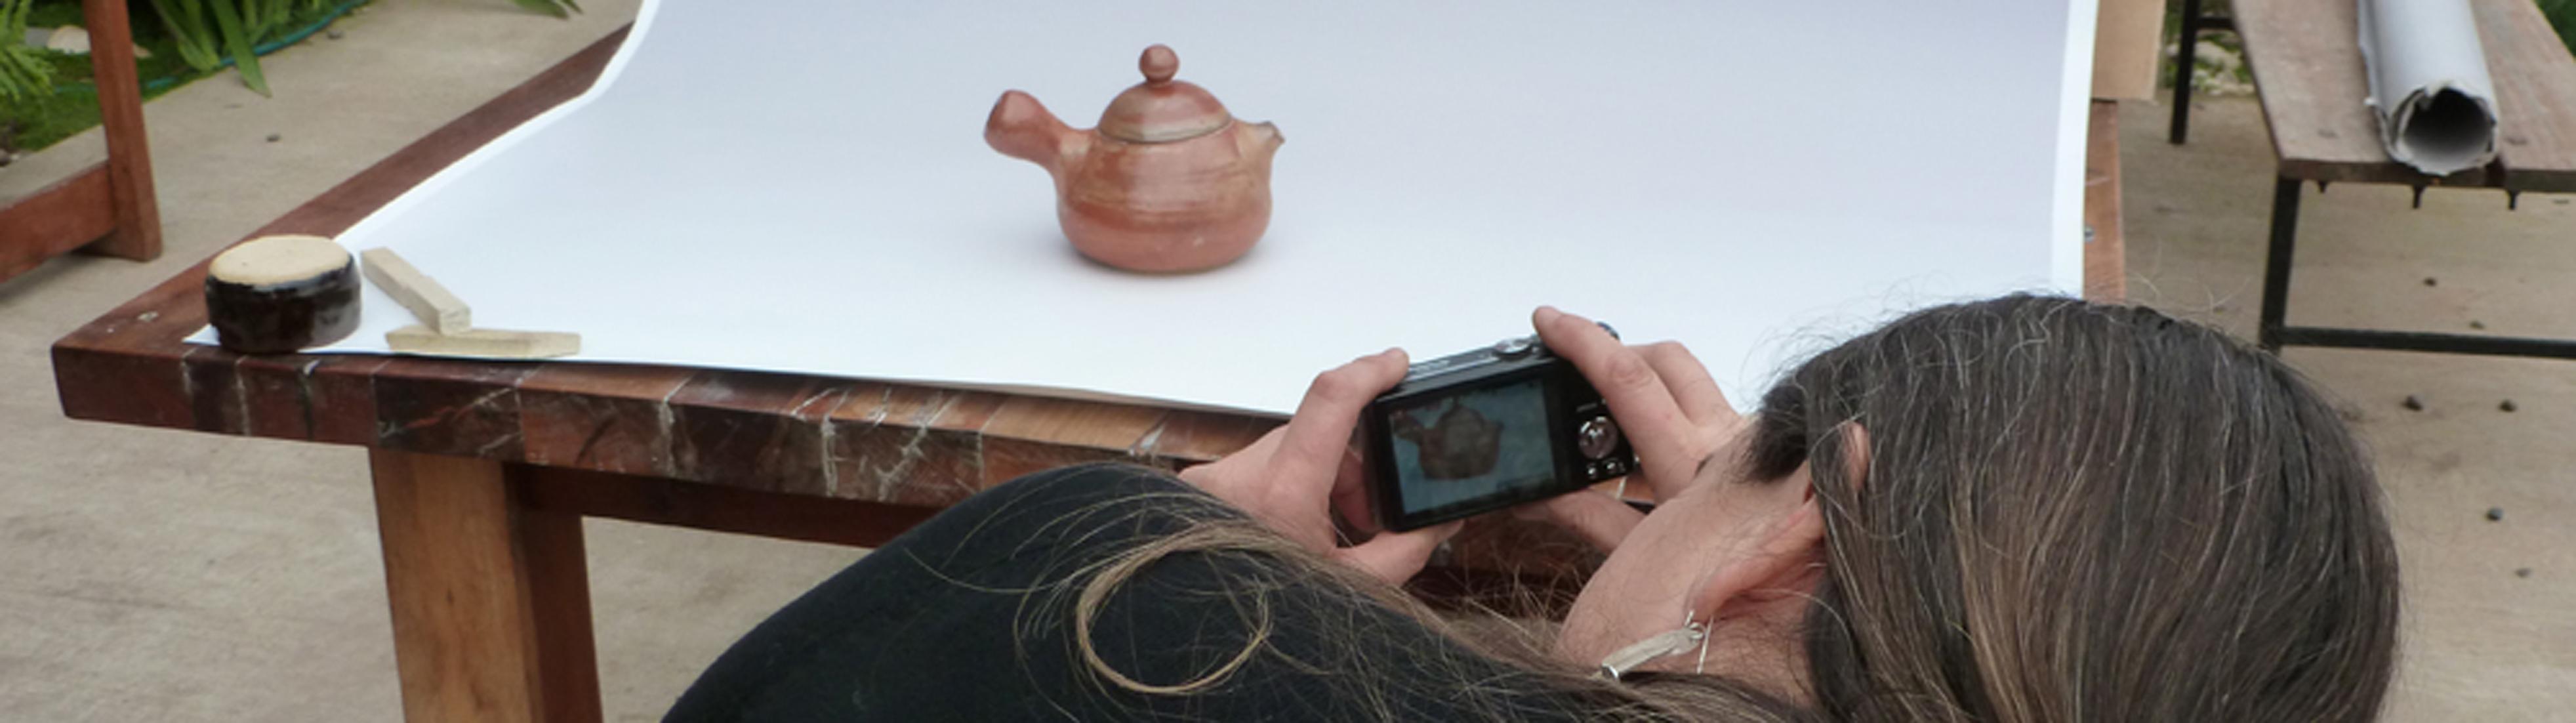 Taller fotografiando piezas